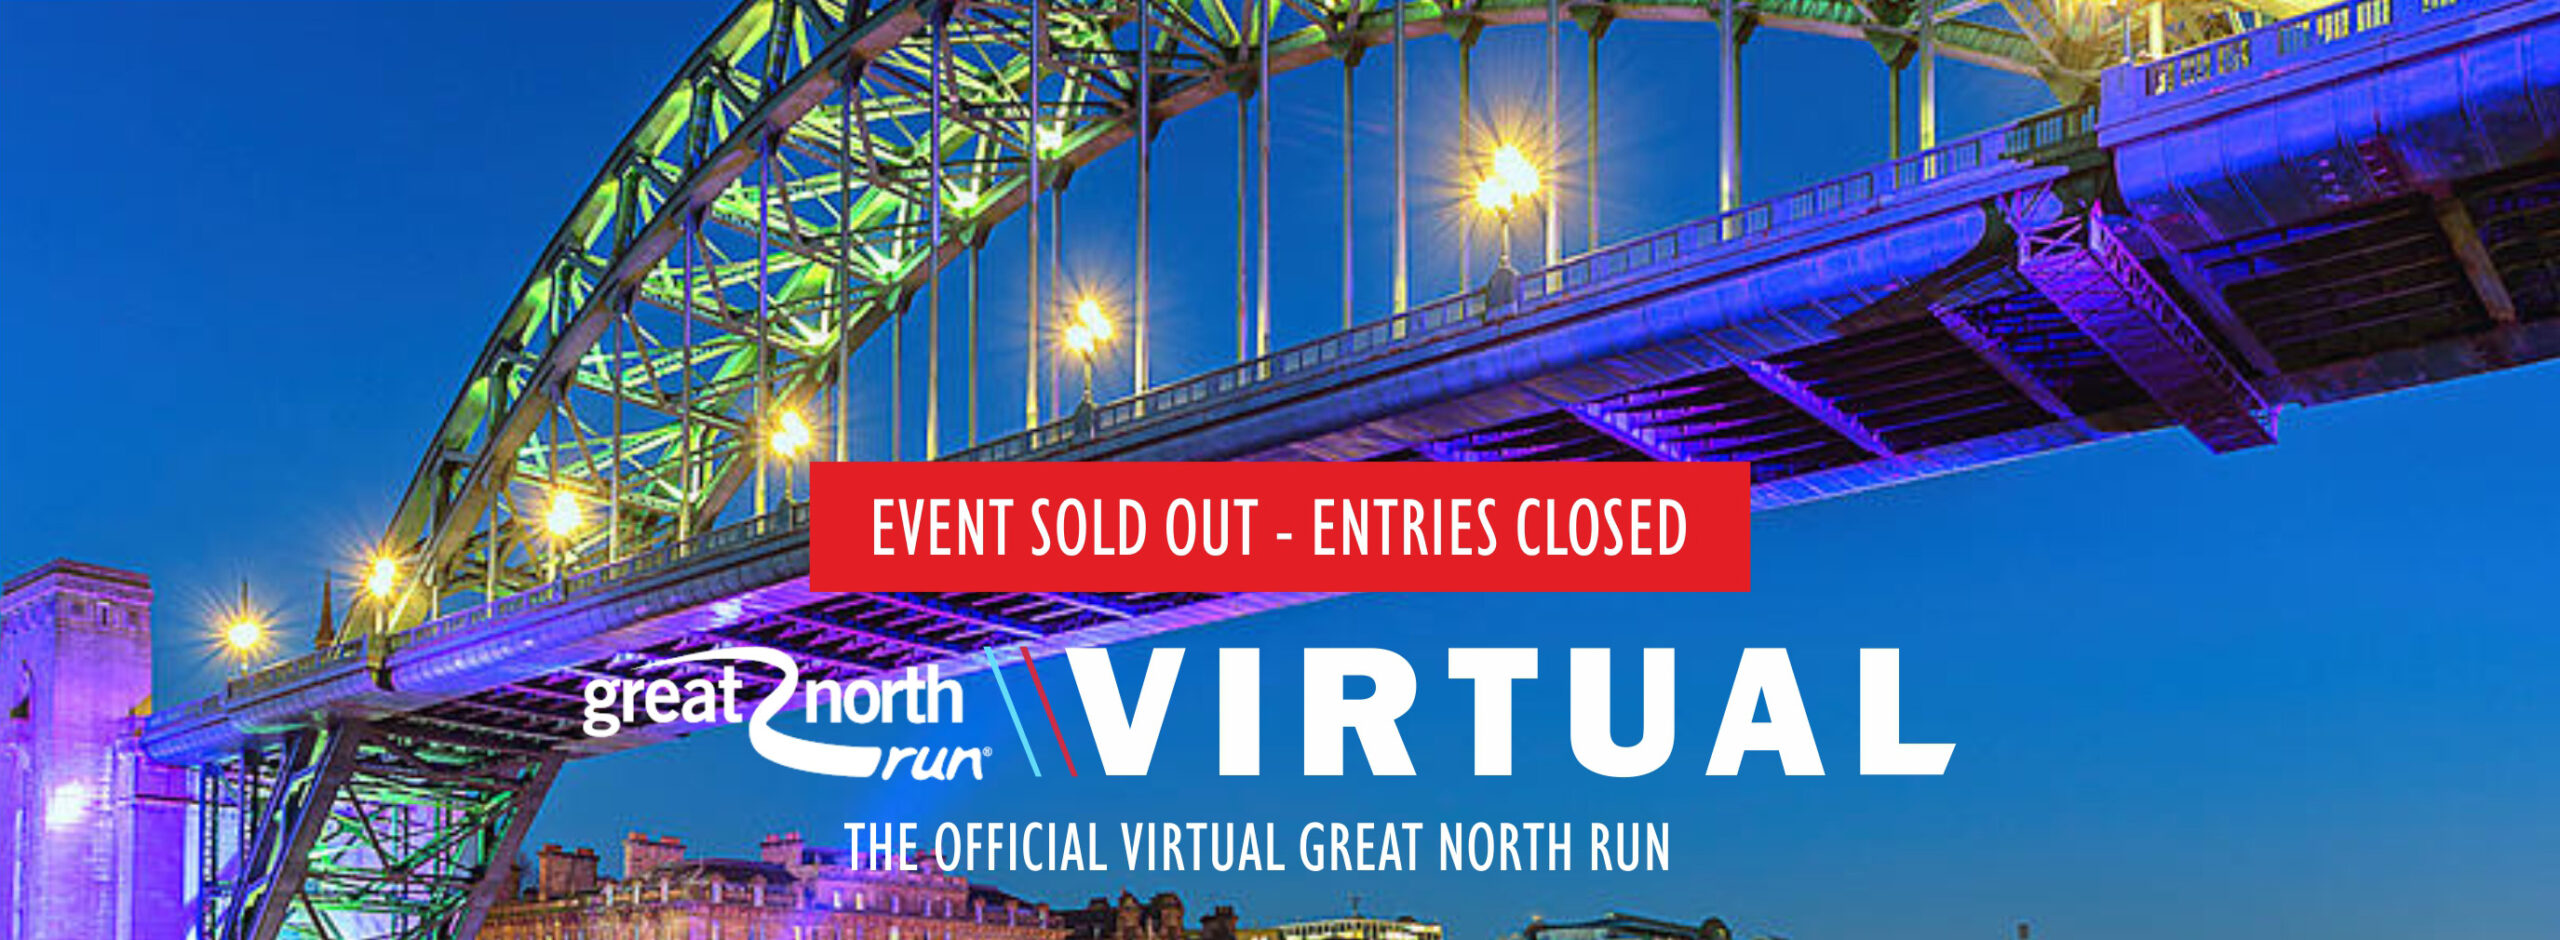 Virtual Great North Run - Applications closed